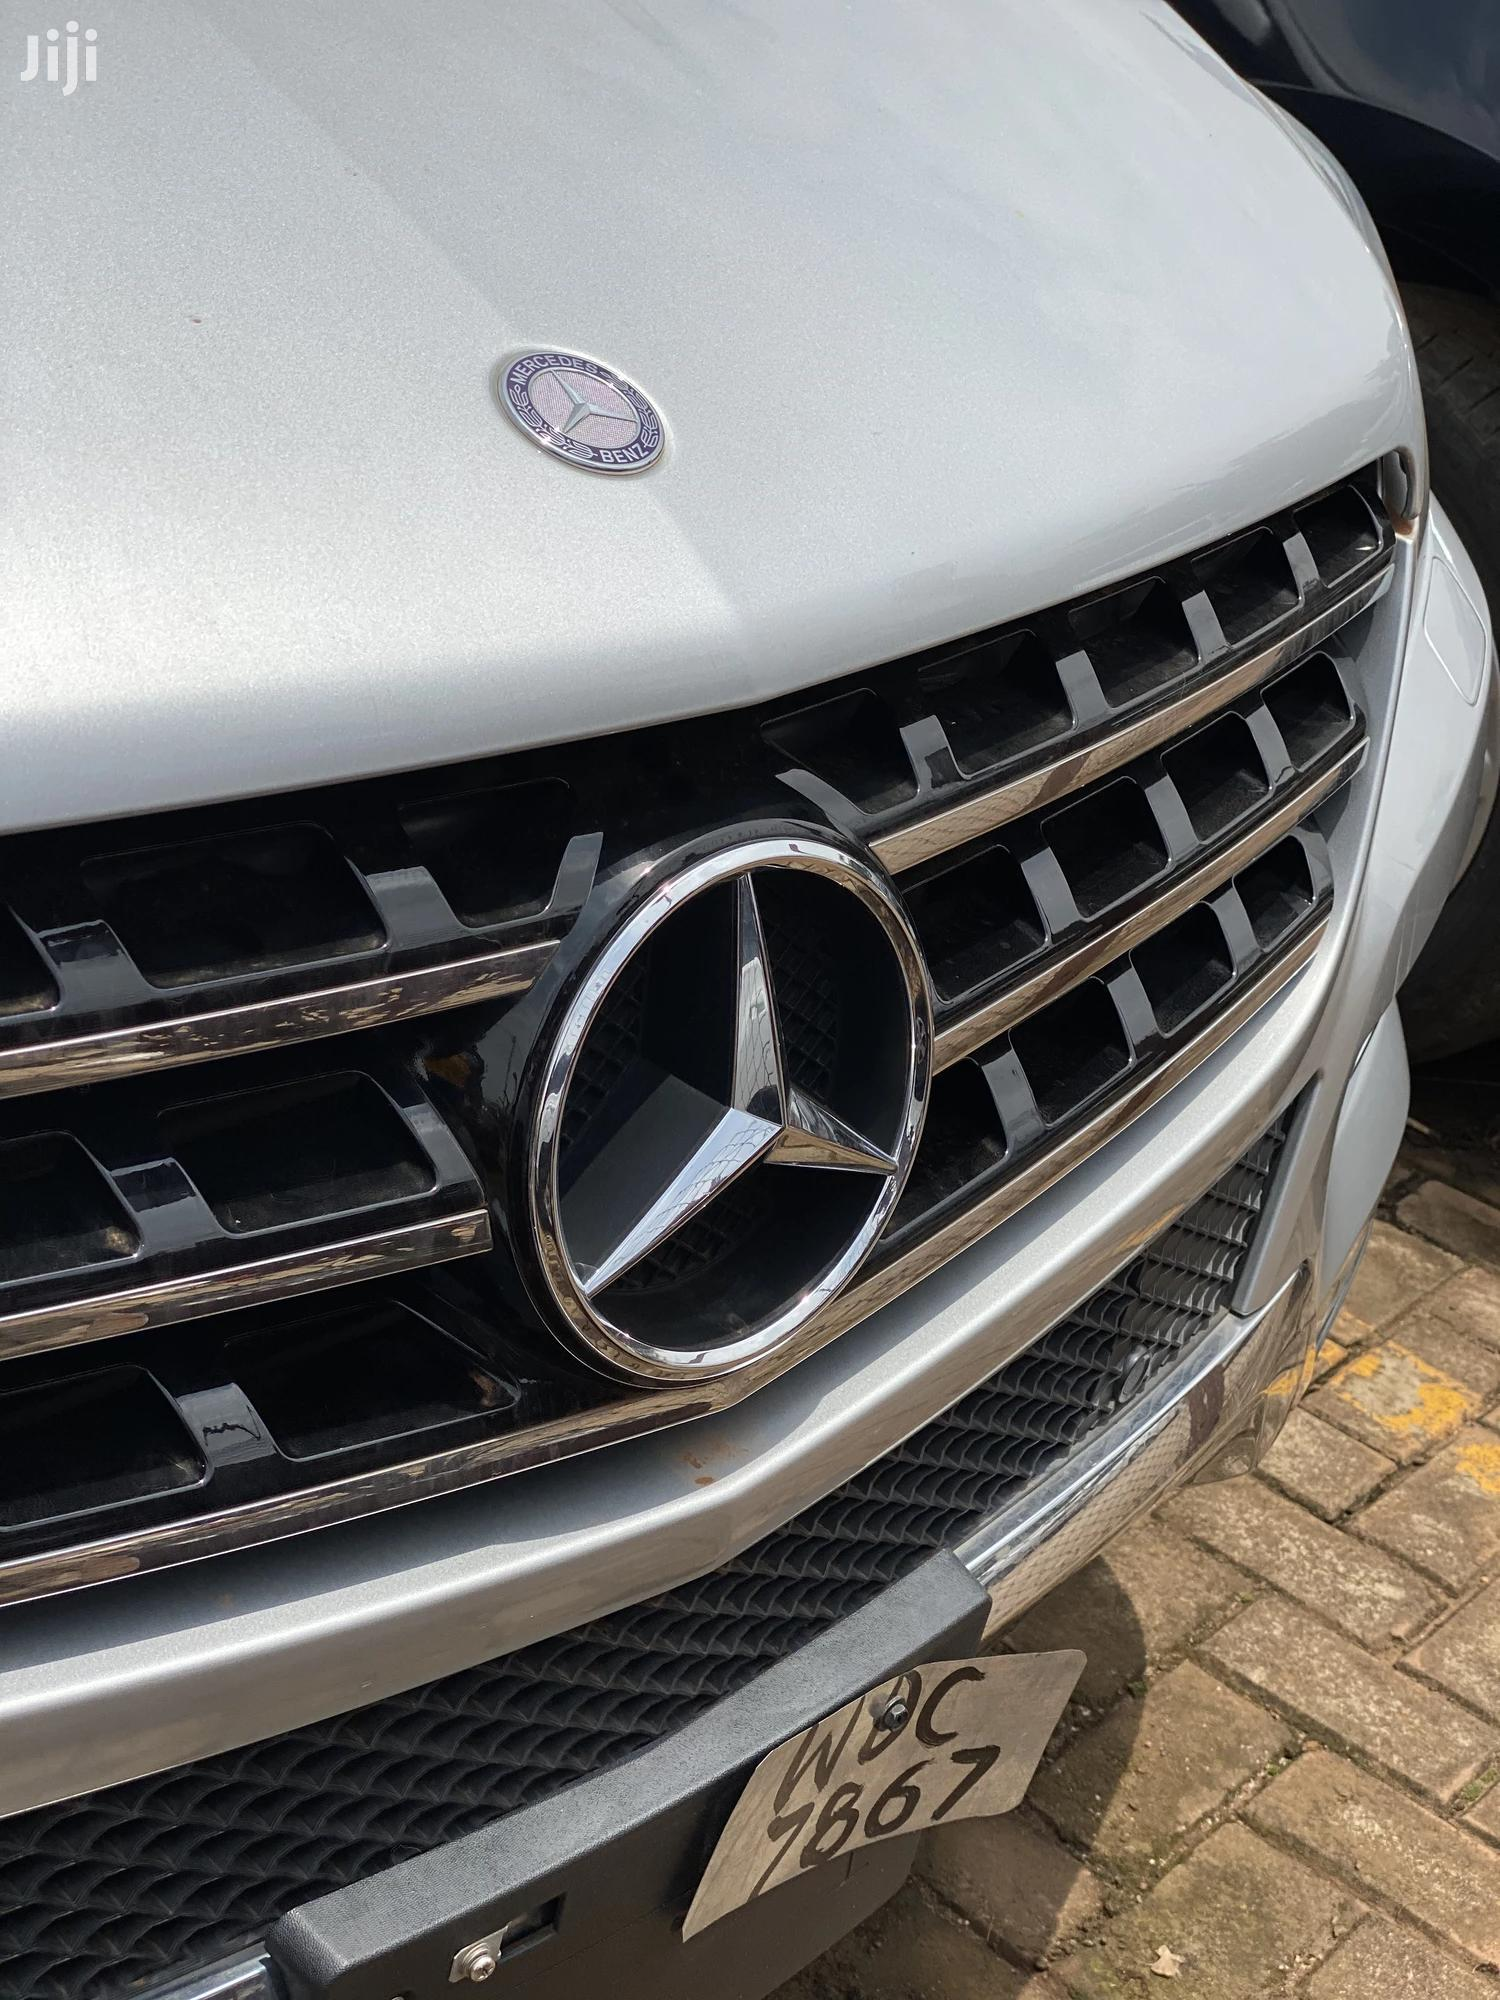 Mercedes-Benz M Class 2013 Silver | Cars for sale in Kampala, Central Region, Uganda